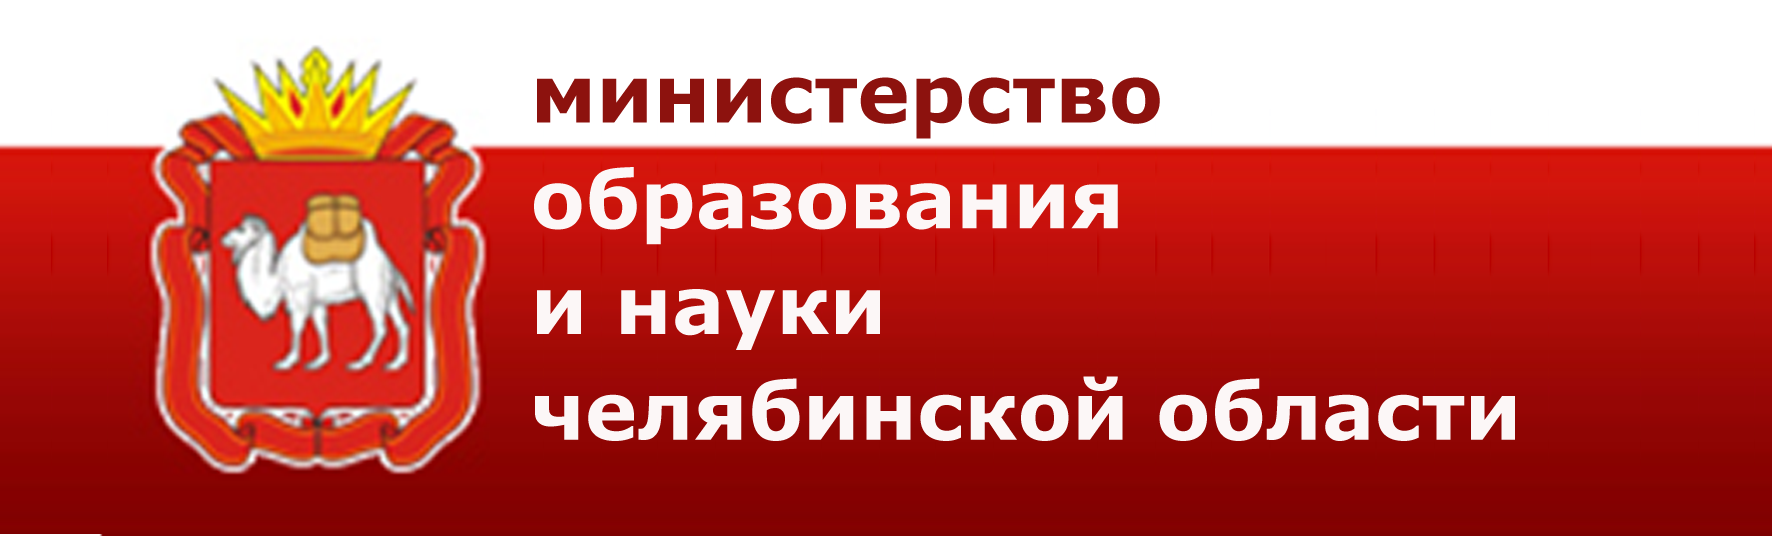 http://umc.chel-edu.ru/New%20Folder/media_pic5994_21012015121608.png